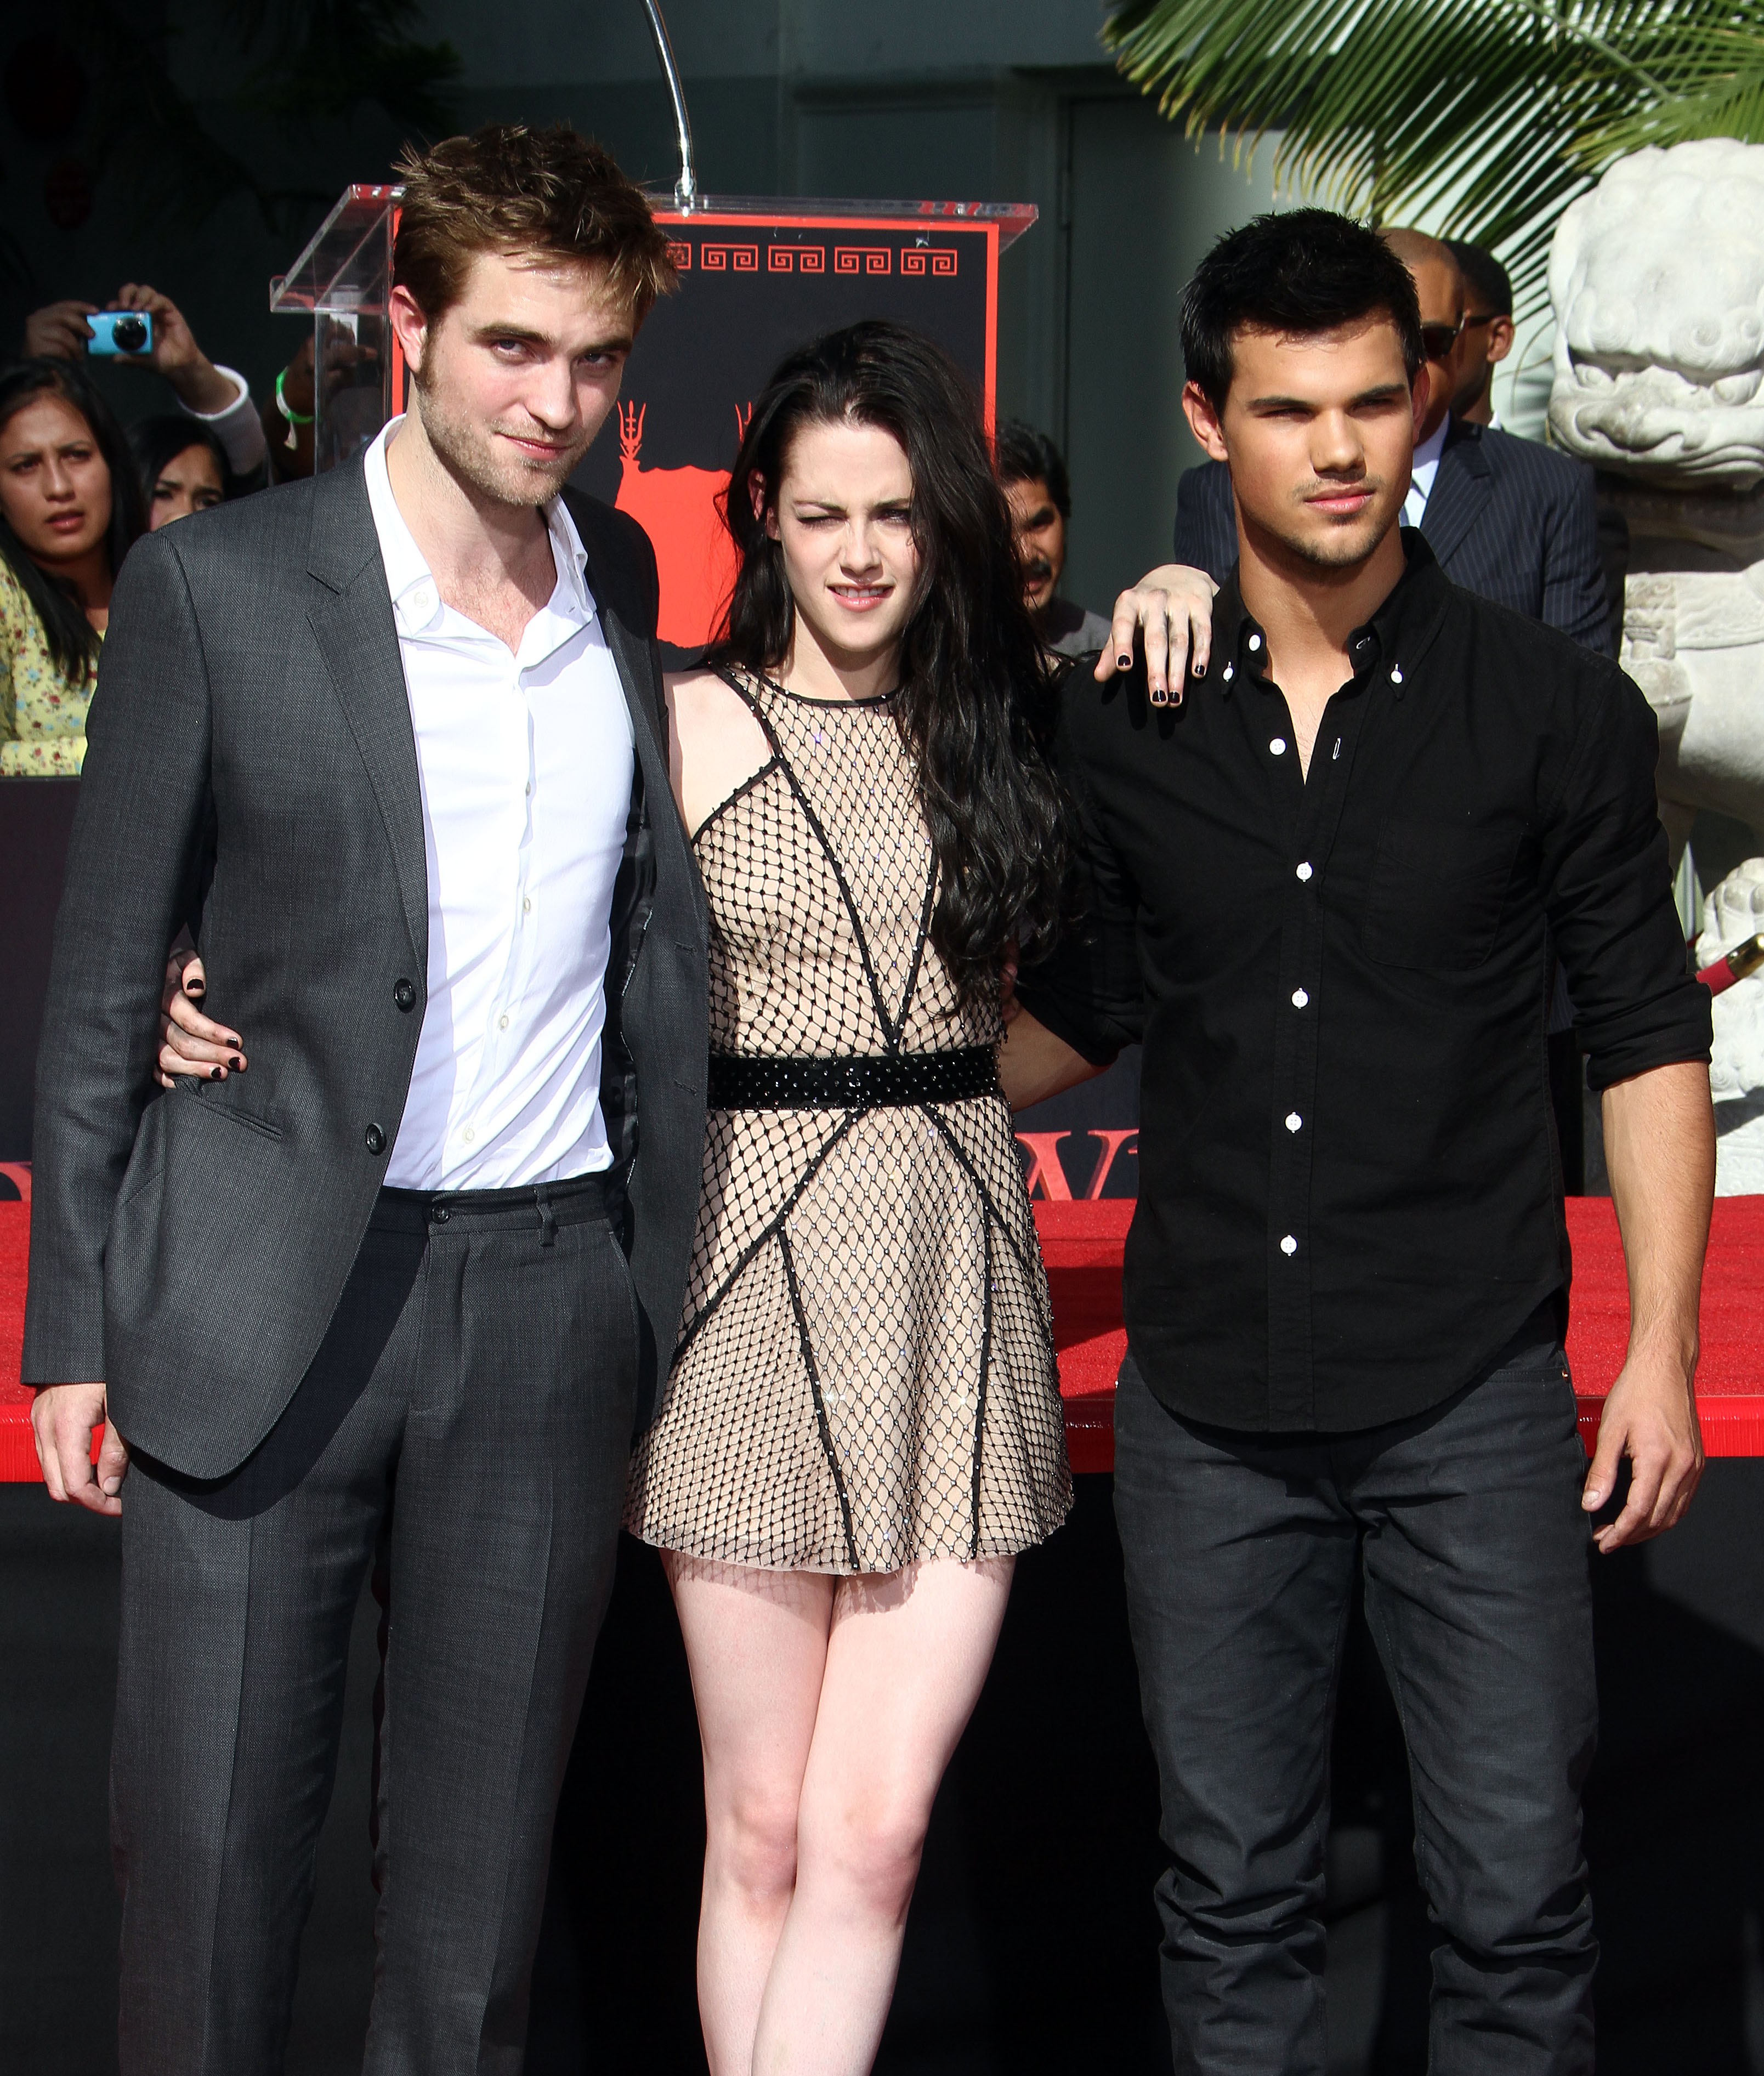 Kristen Stewart, Robert Pattinson And Taylor Lautner Hand ... Robert Pattinson Dating